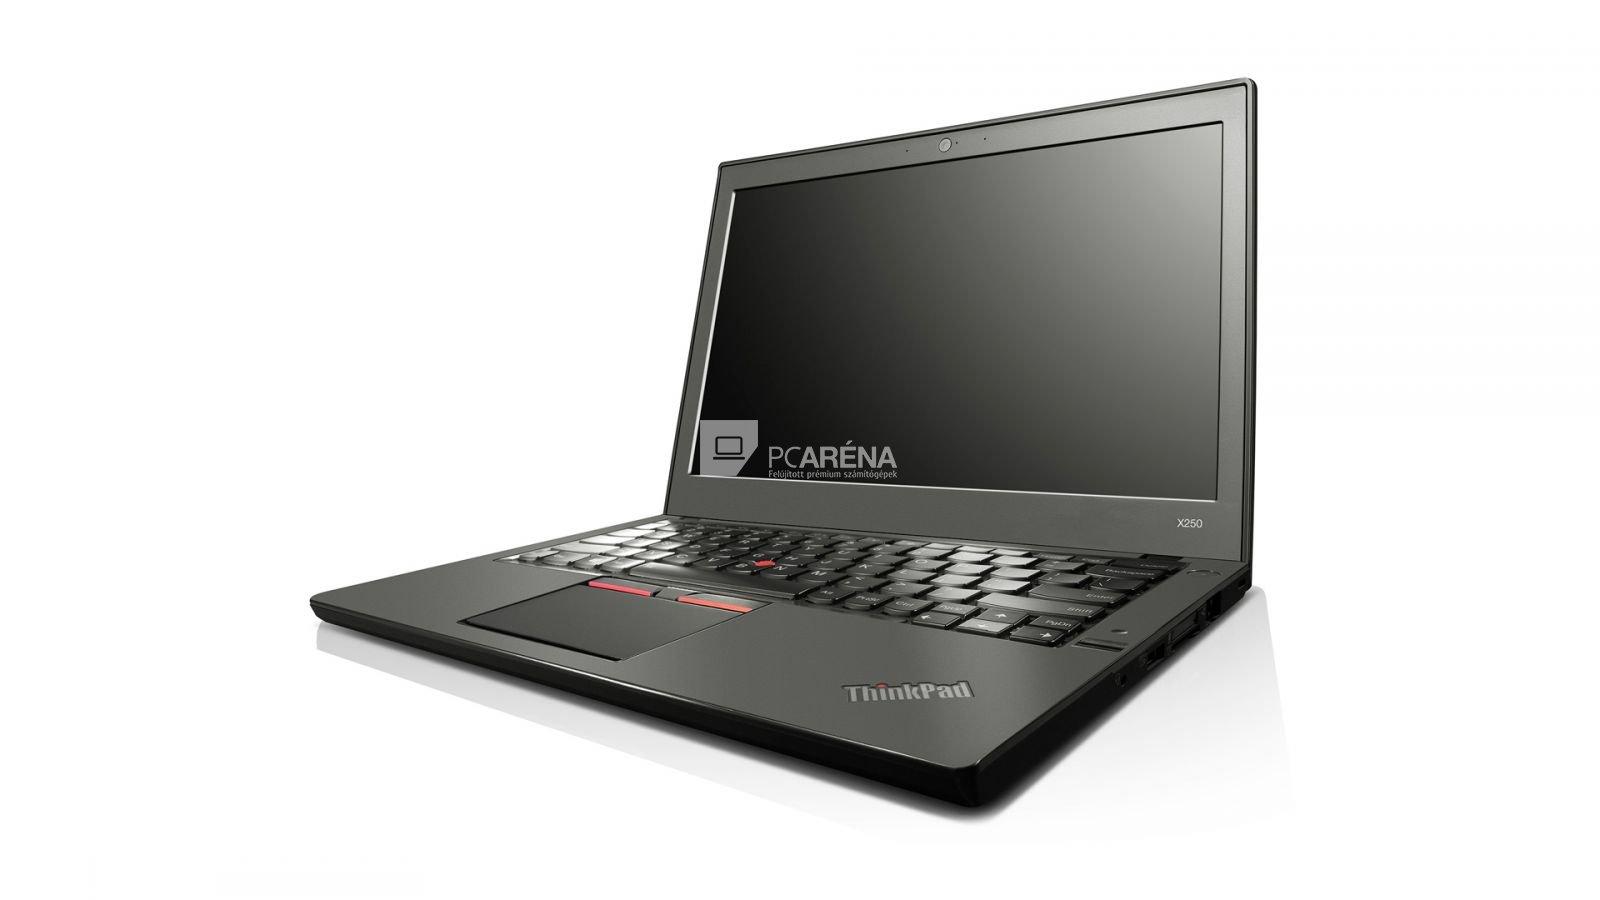 Lenovo ThinkPad X250 laptop